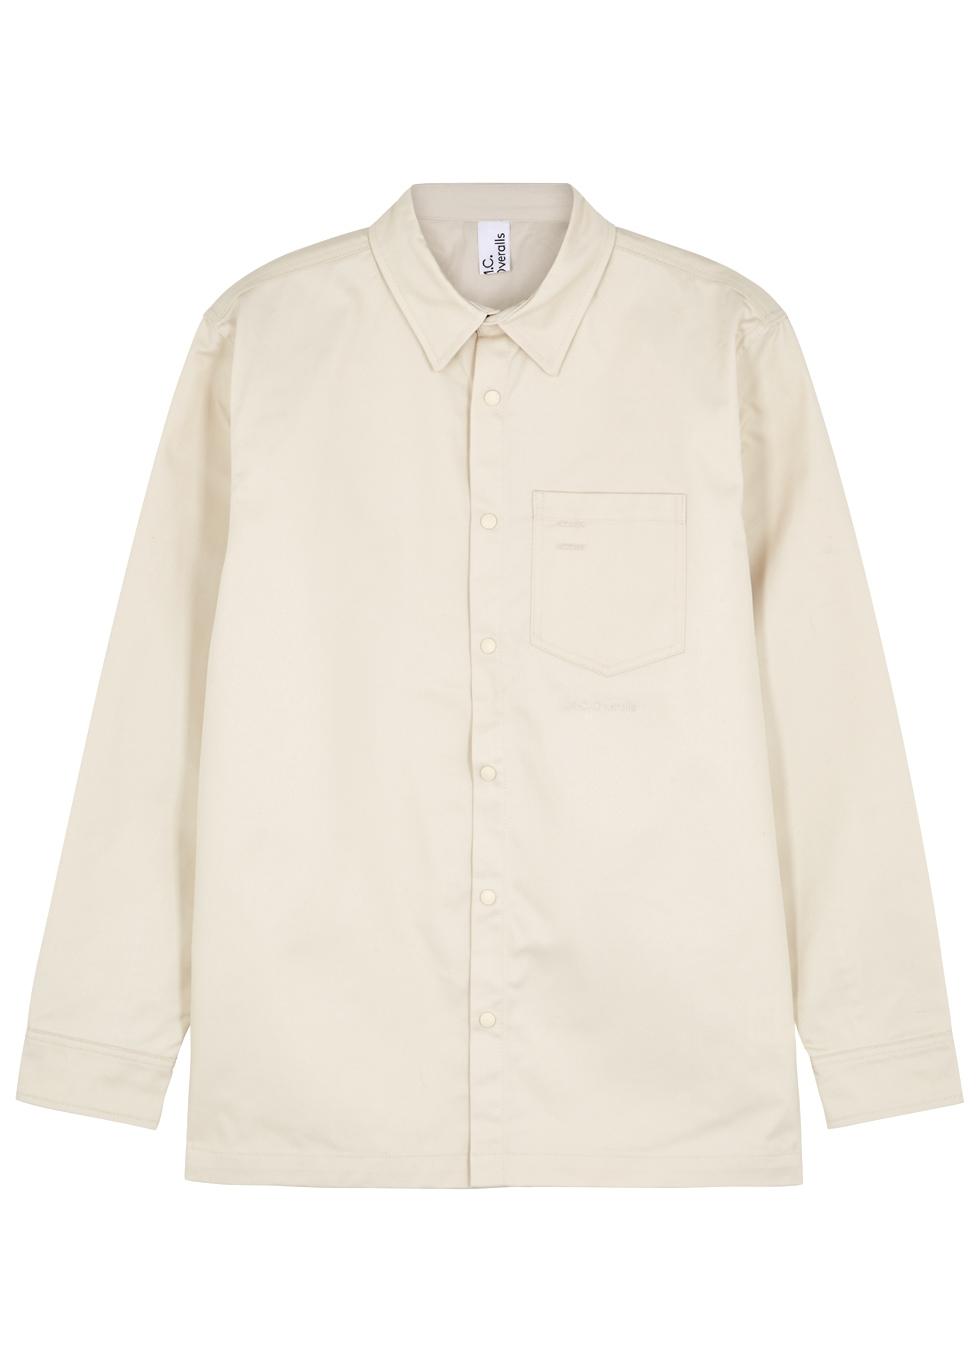 M.C. OVERALLS Sand Twill Shirt in Beige